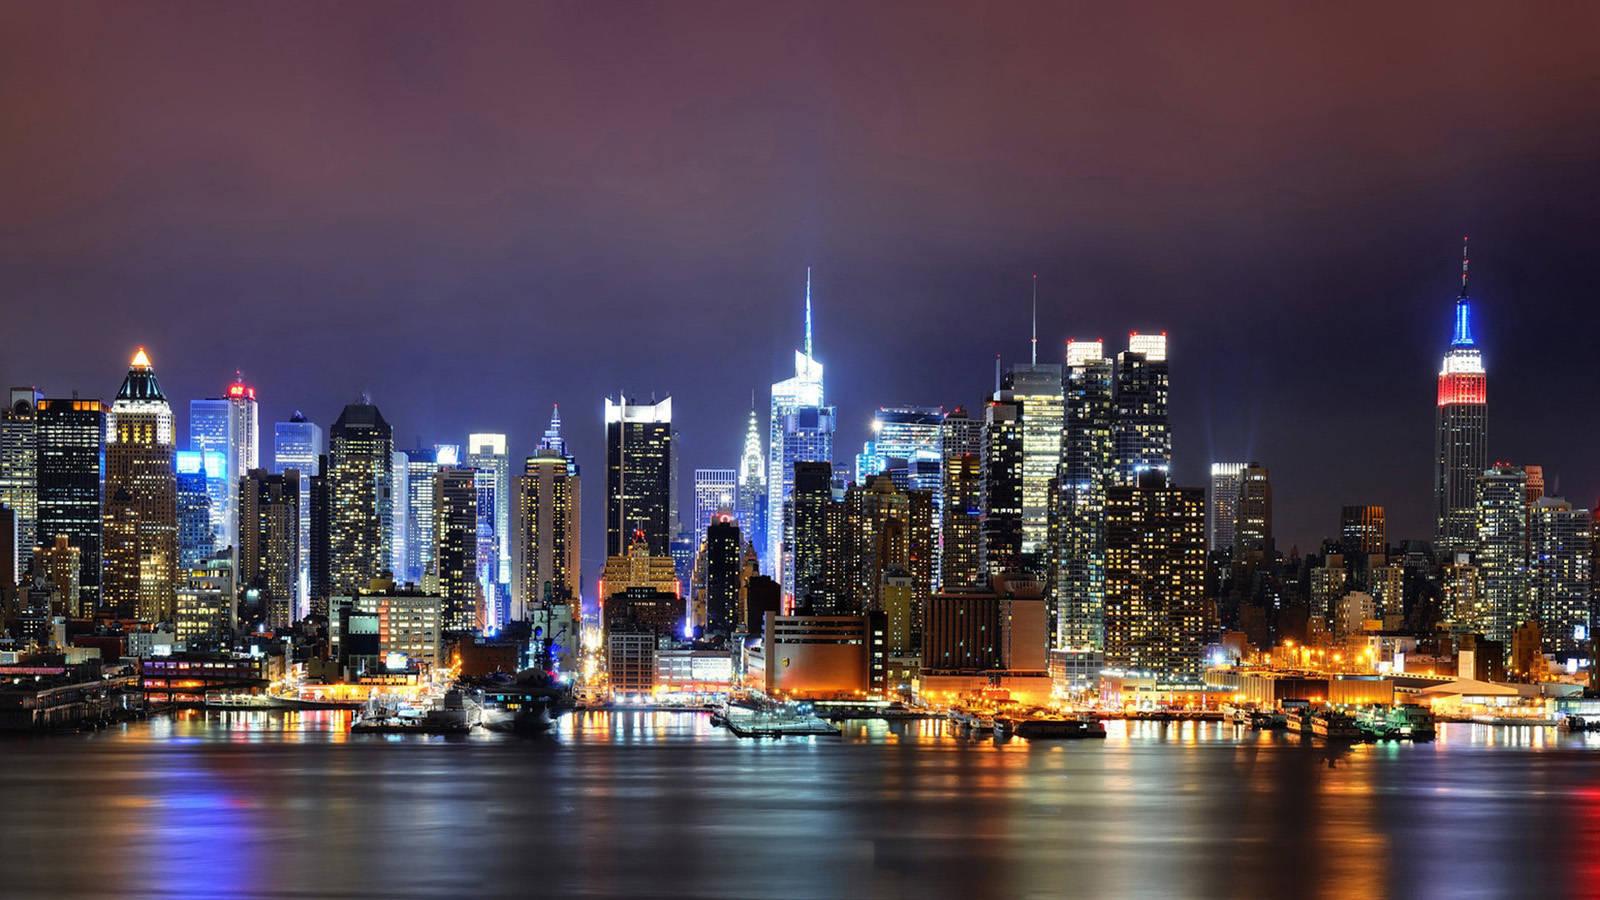 New York city light building wallpaper city wallpaper 1600x900